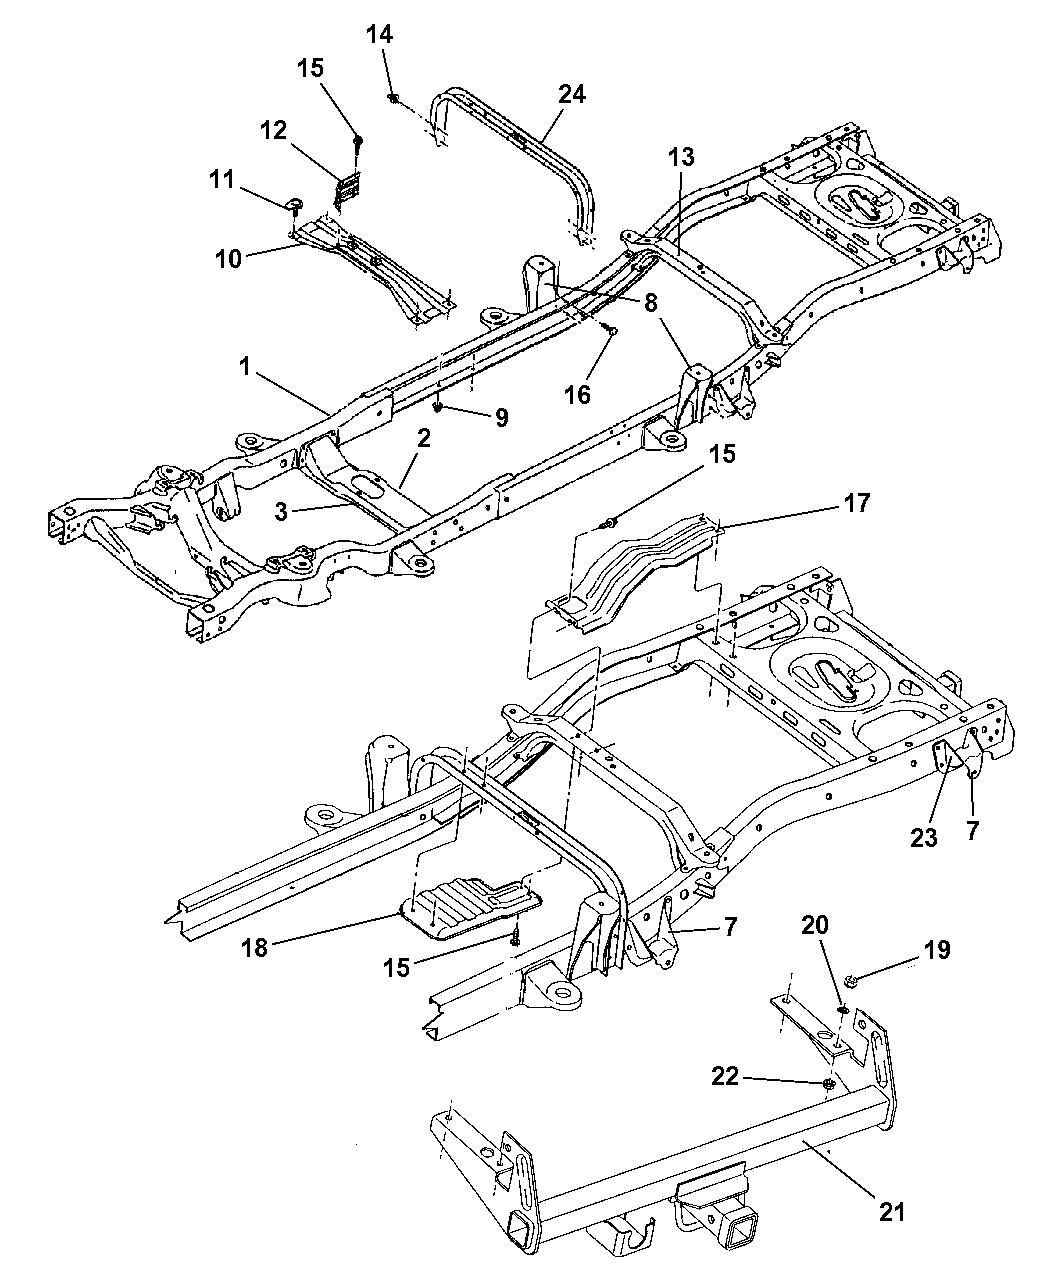 1999 Dodge Dakota Frame - Mopar Parts Giant